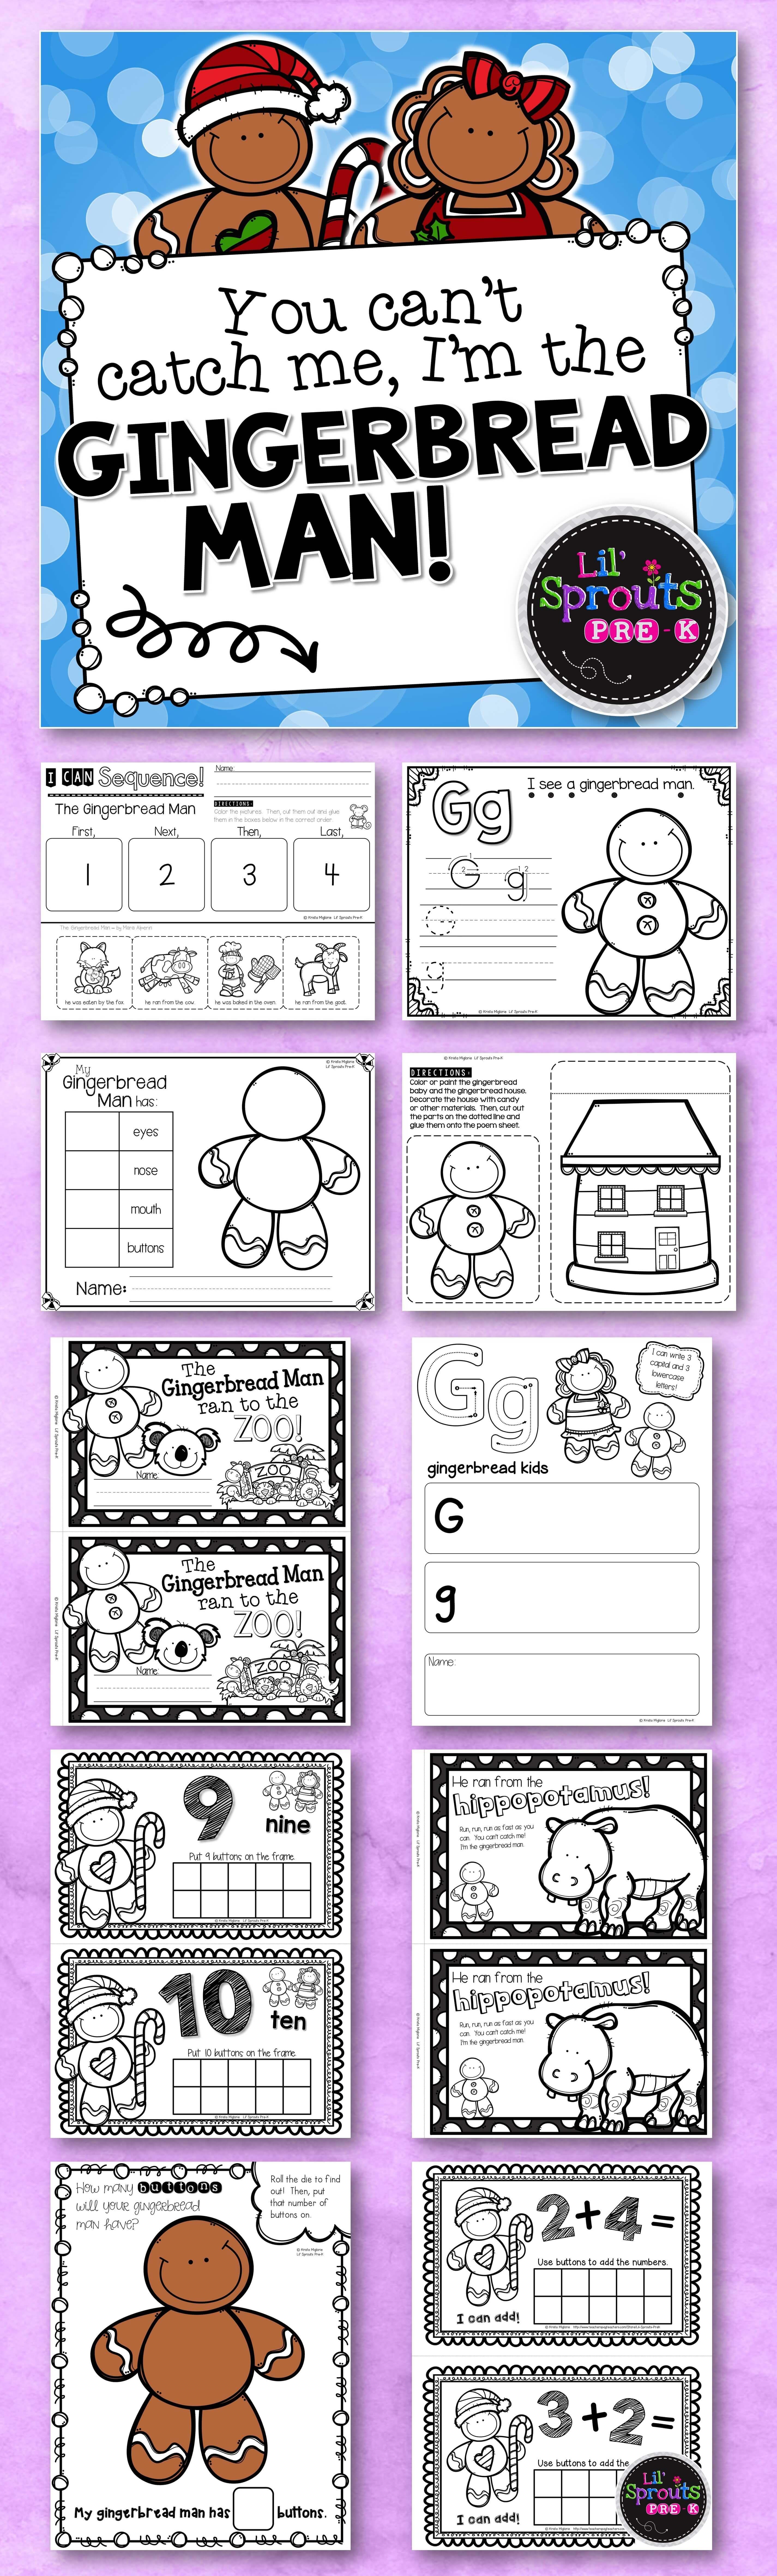 The Gingerbread Man Comprehensive Unit - Preschool, Pre-K/PreK ...